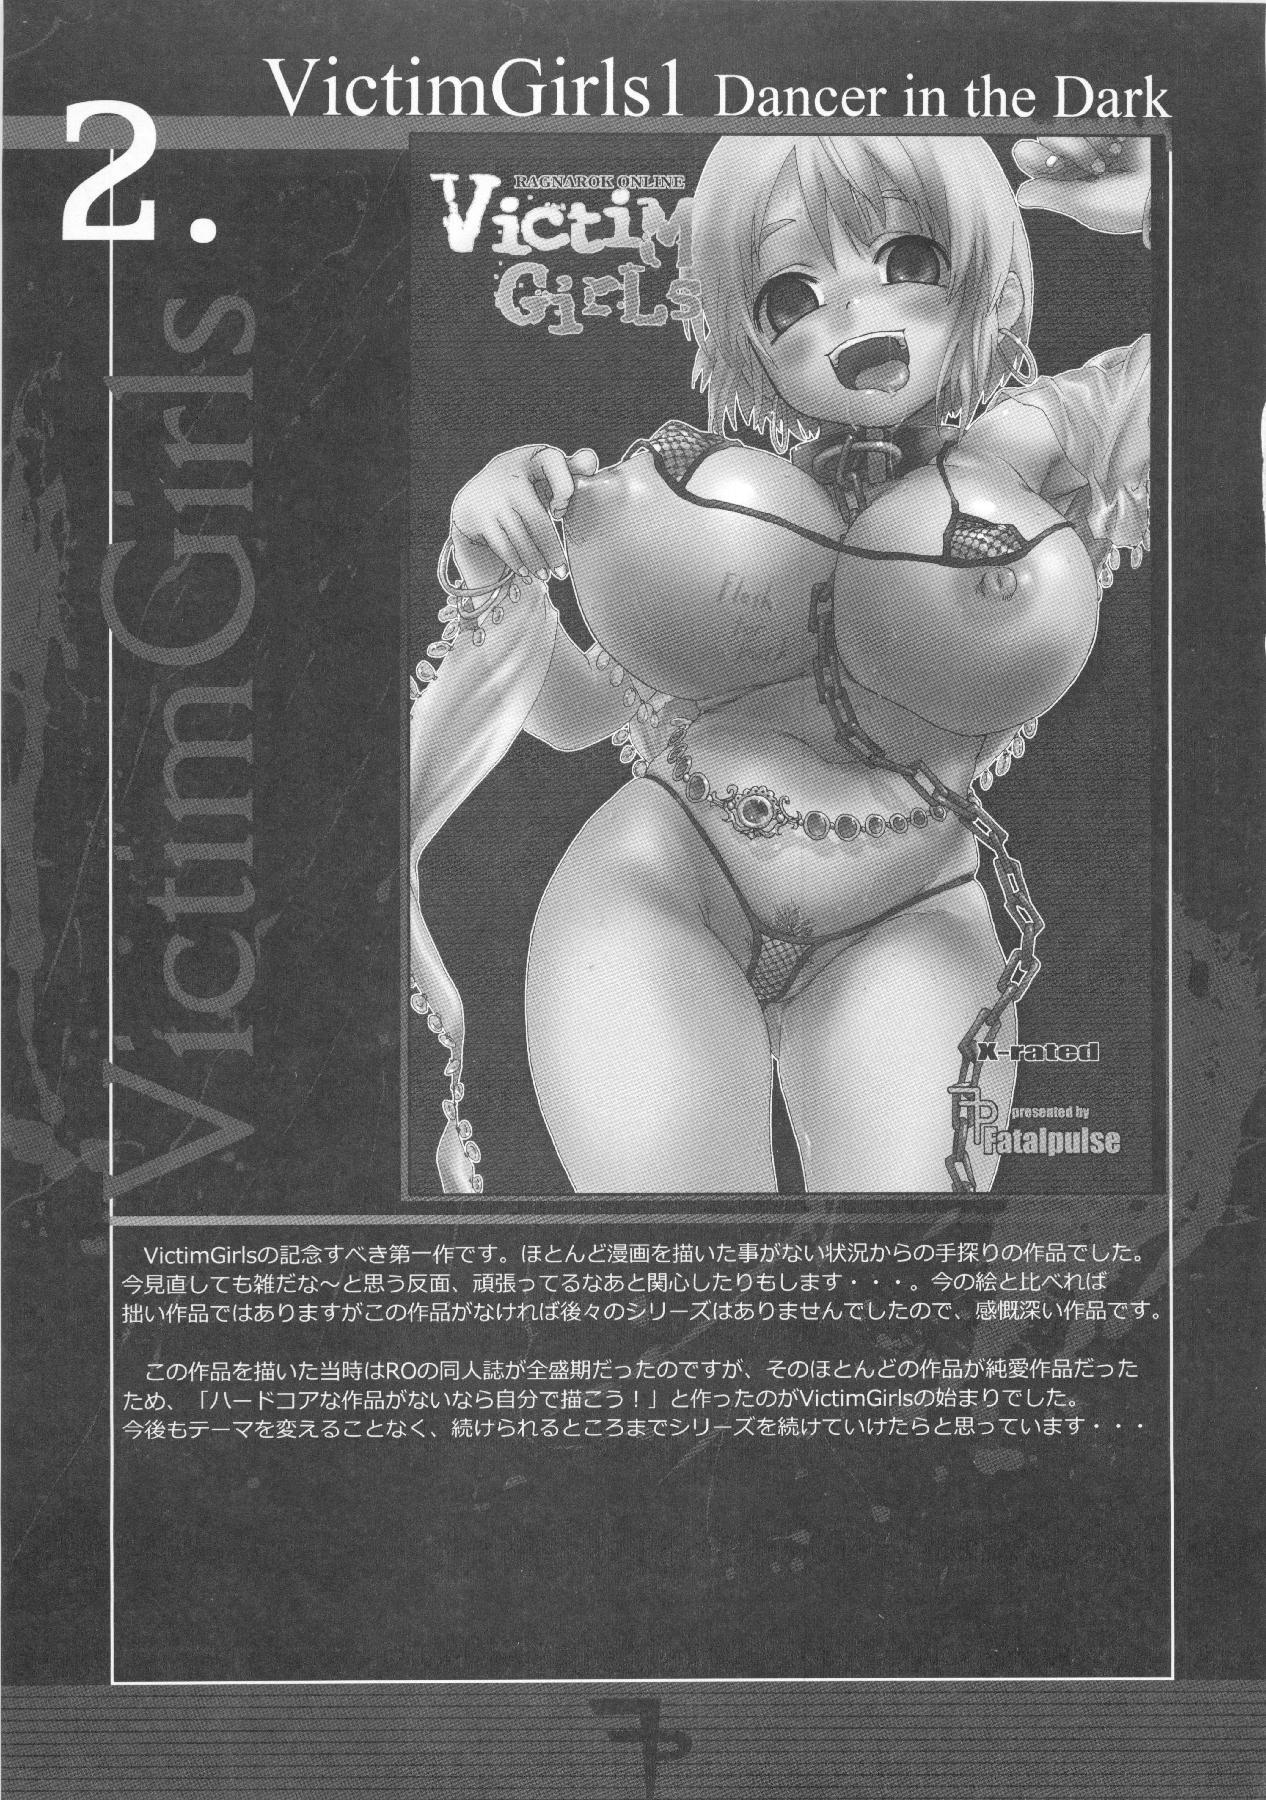 (C83) [Fatalpulse (Asanagi)] VictimGirls Compiled Vol.1 -Victimgirls Soushuuhen 1- MMO Game Selection (Various) 51